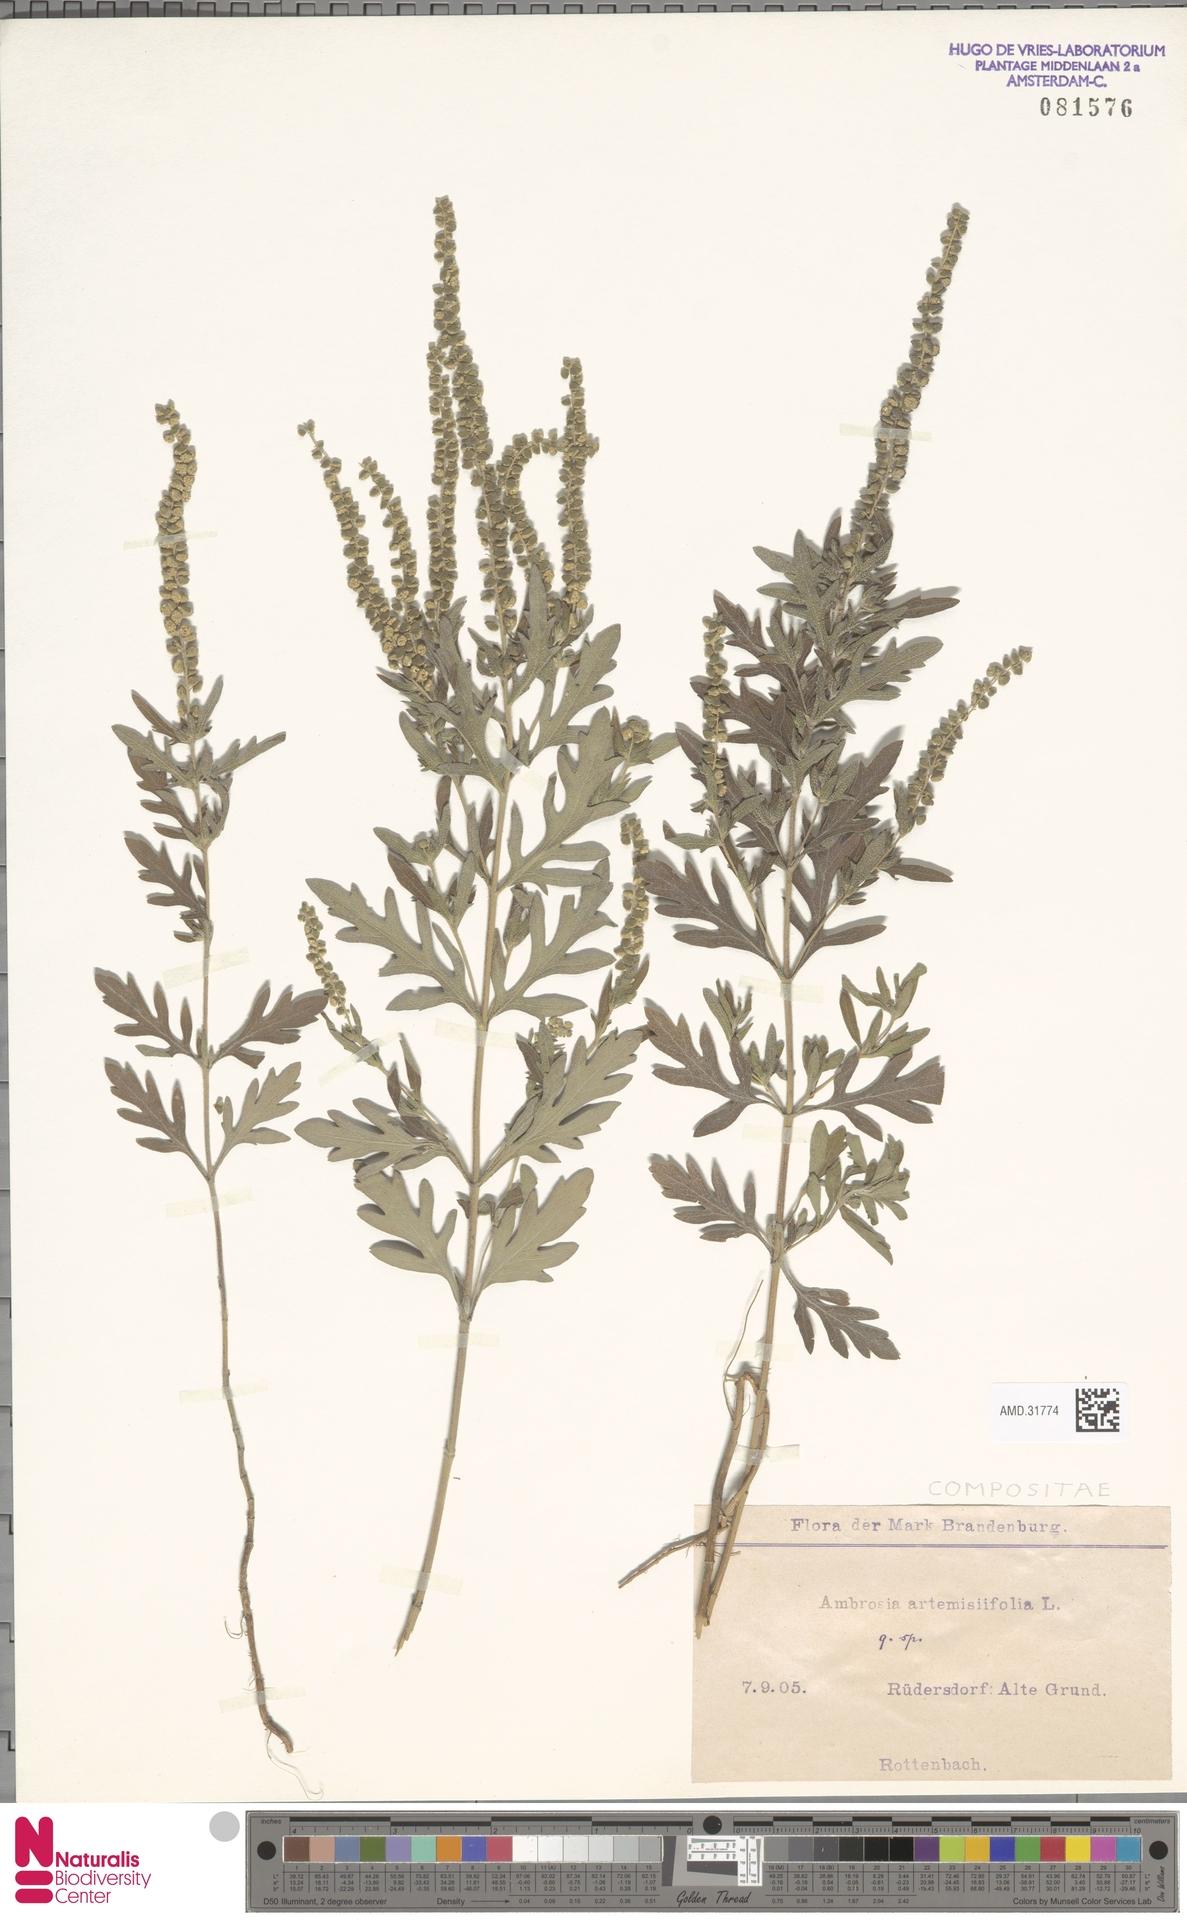 AMD.31774   Ambrosia artemisiifolia L.